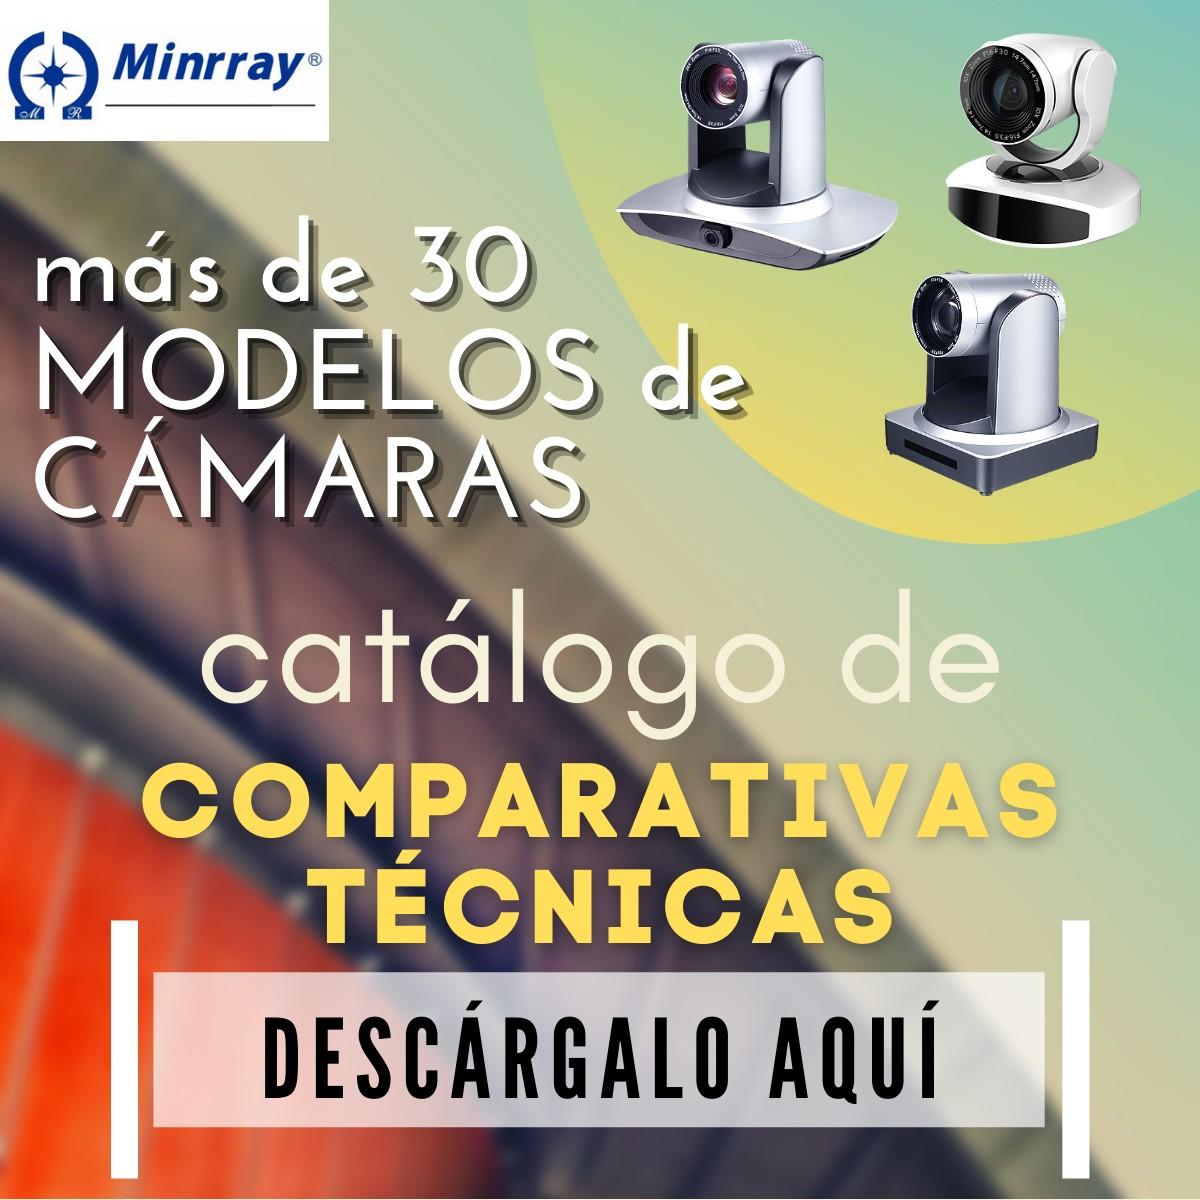 CATÁLOGO ESPECIFICACIONES TÉCNICAS CÁMARAS MINRRAY